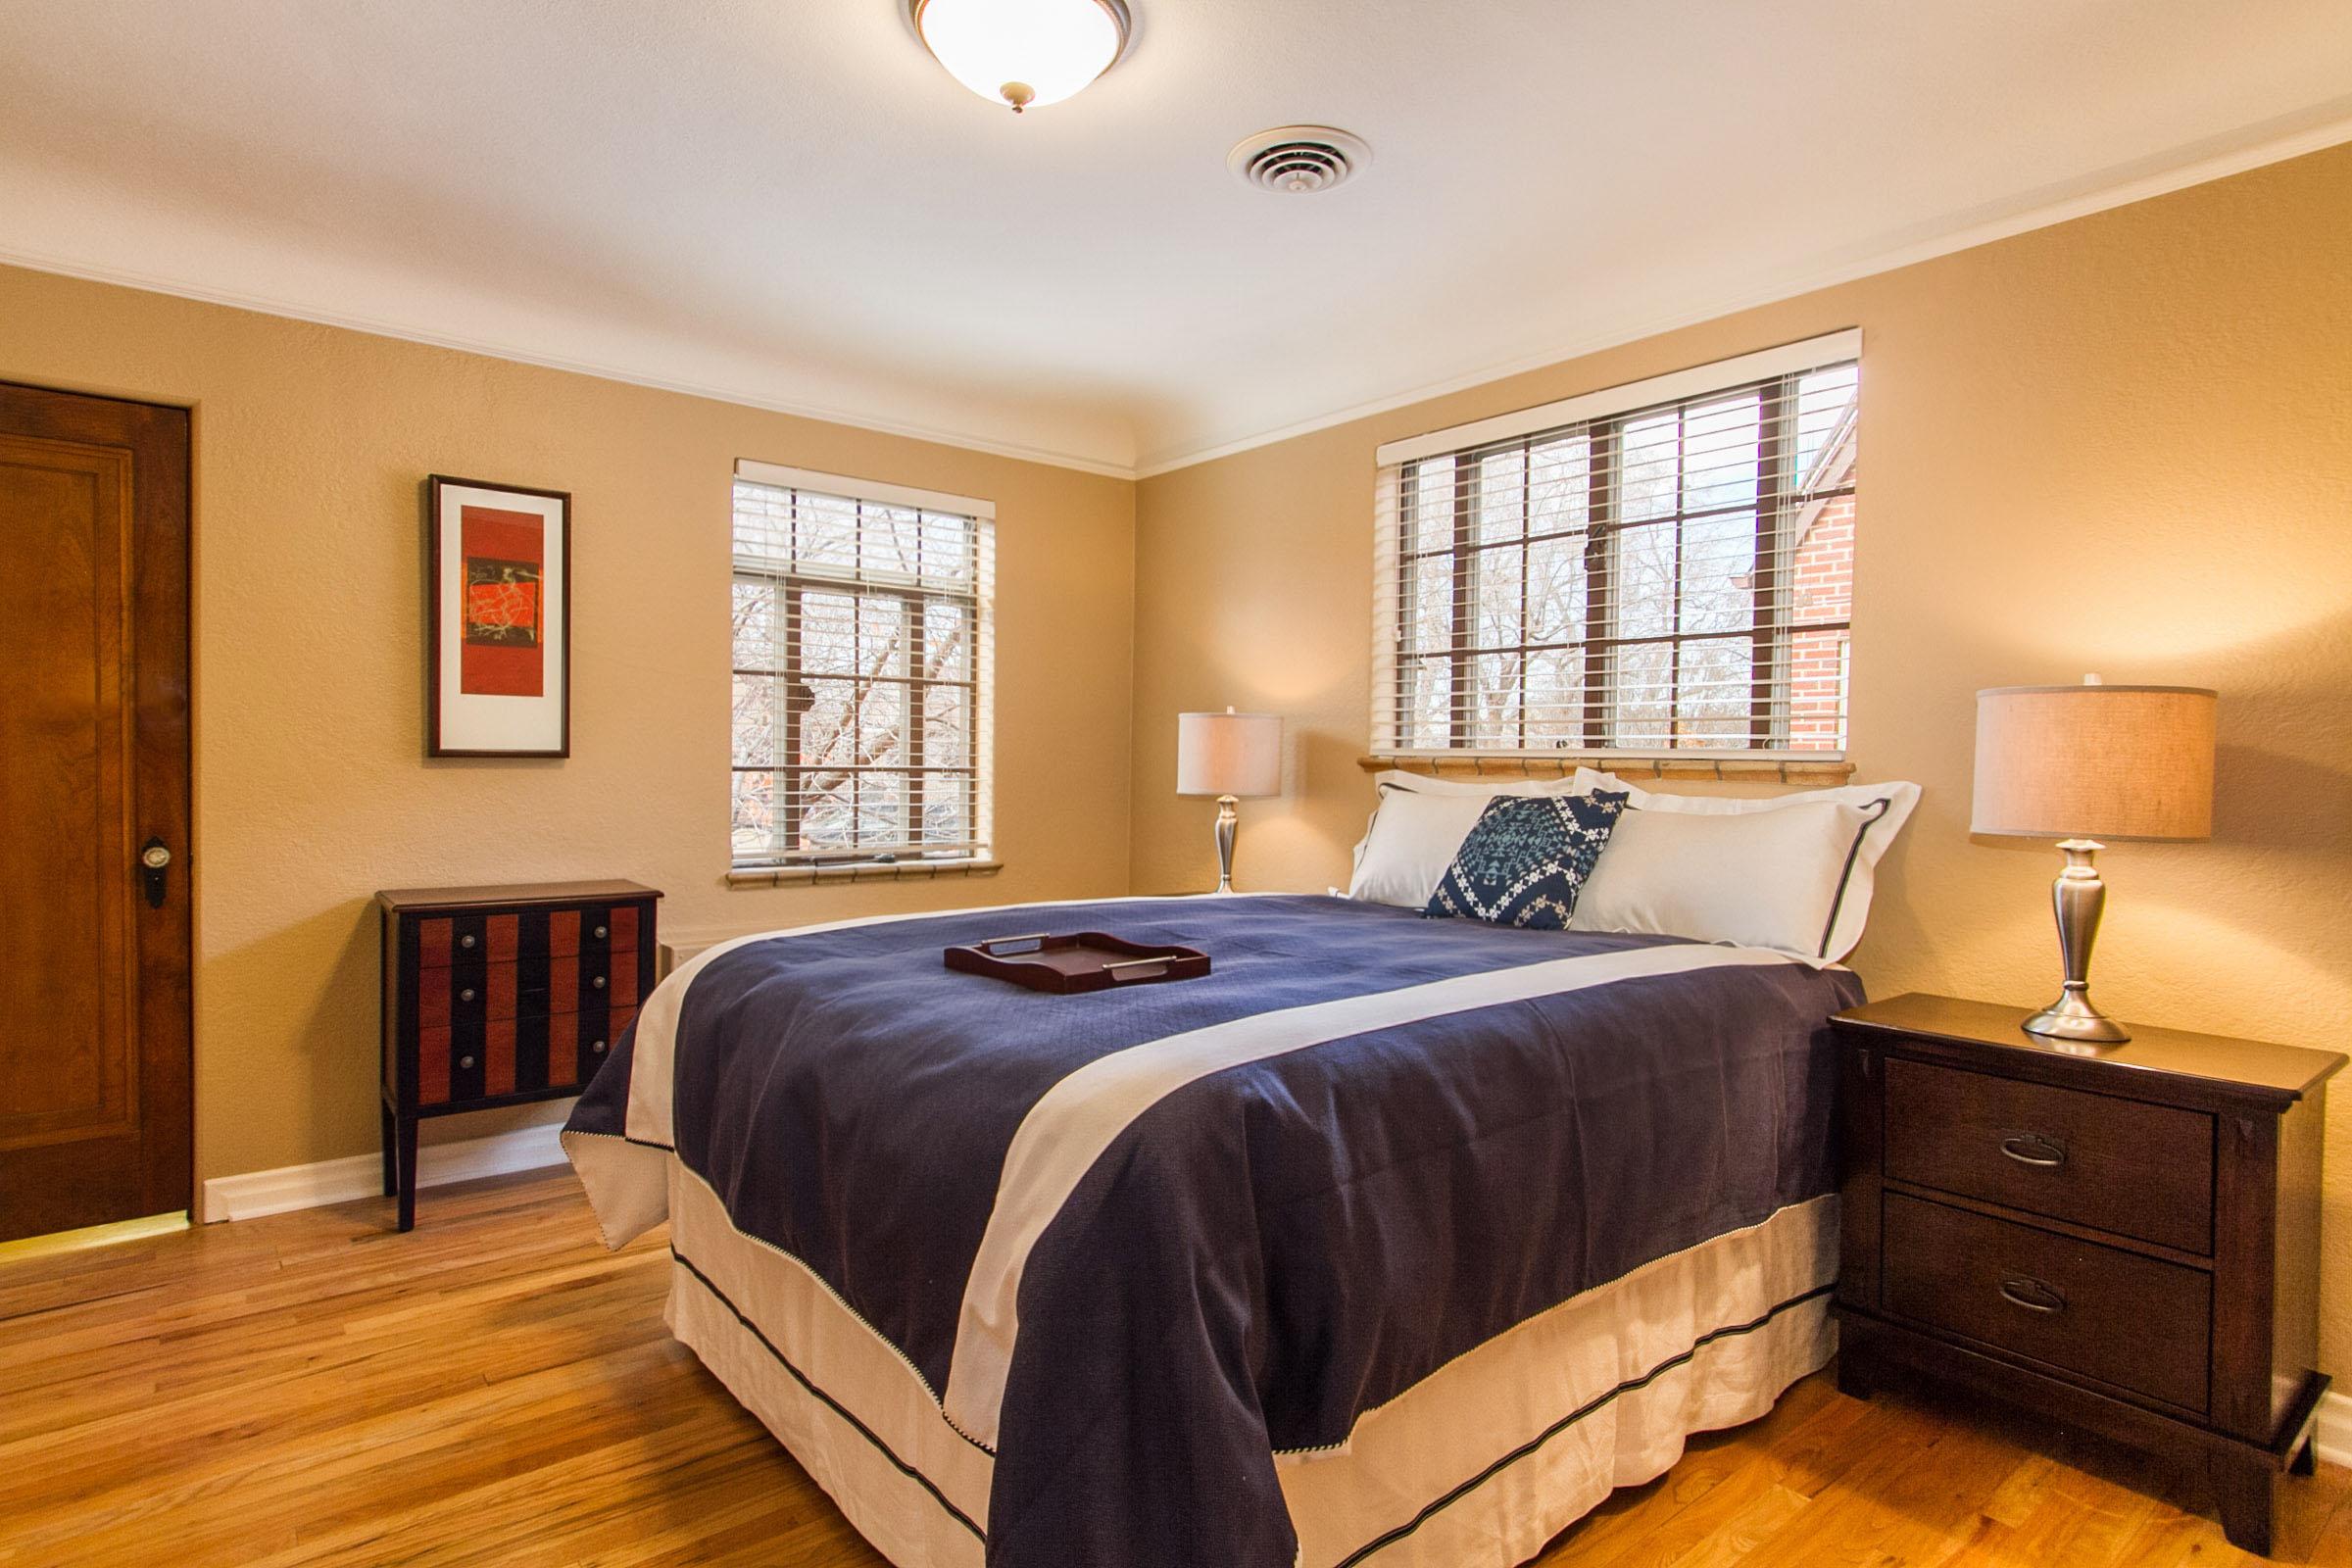 1177275_Large-Main-Floor-Front-Bedroom_high.jpg